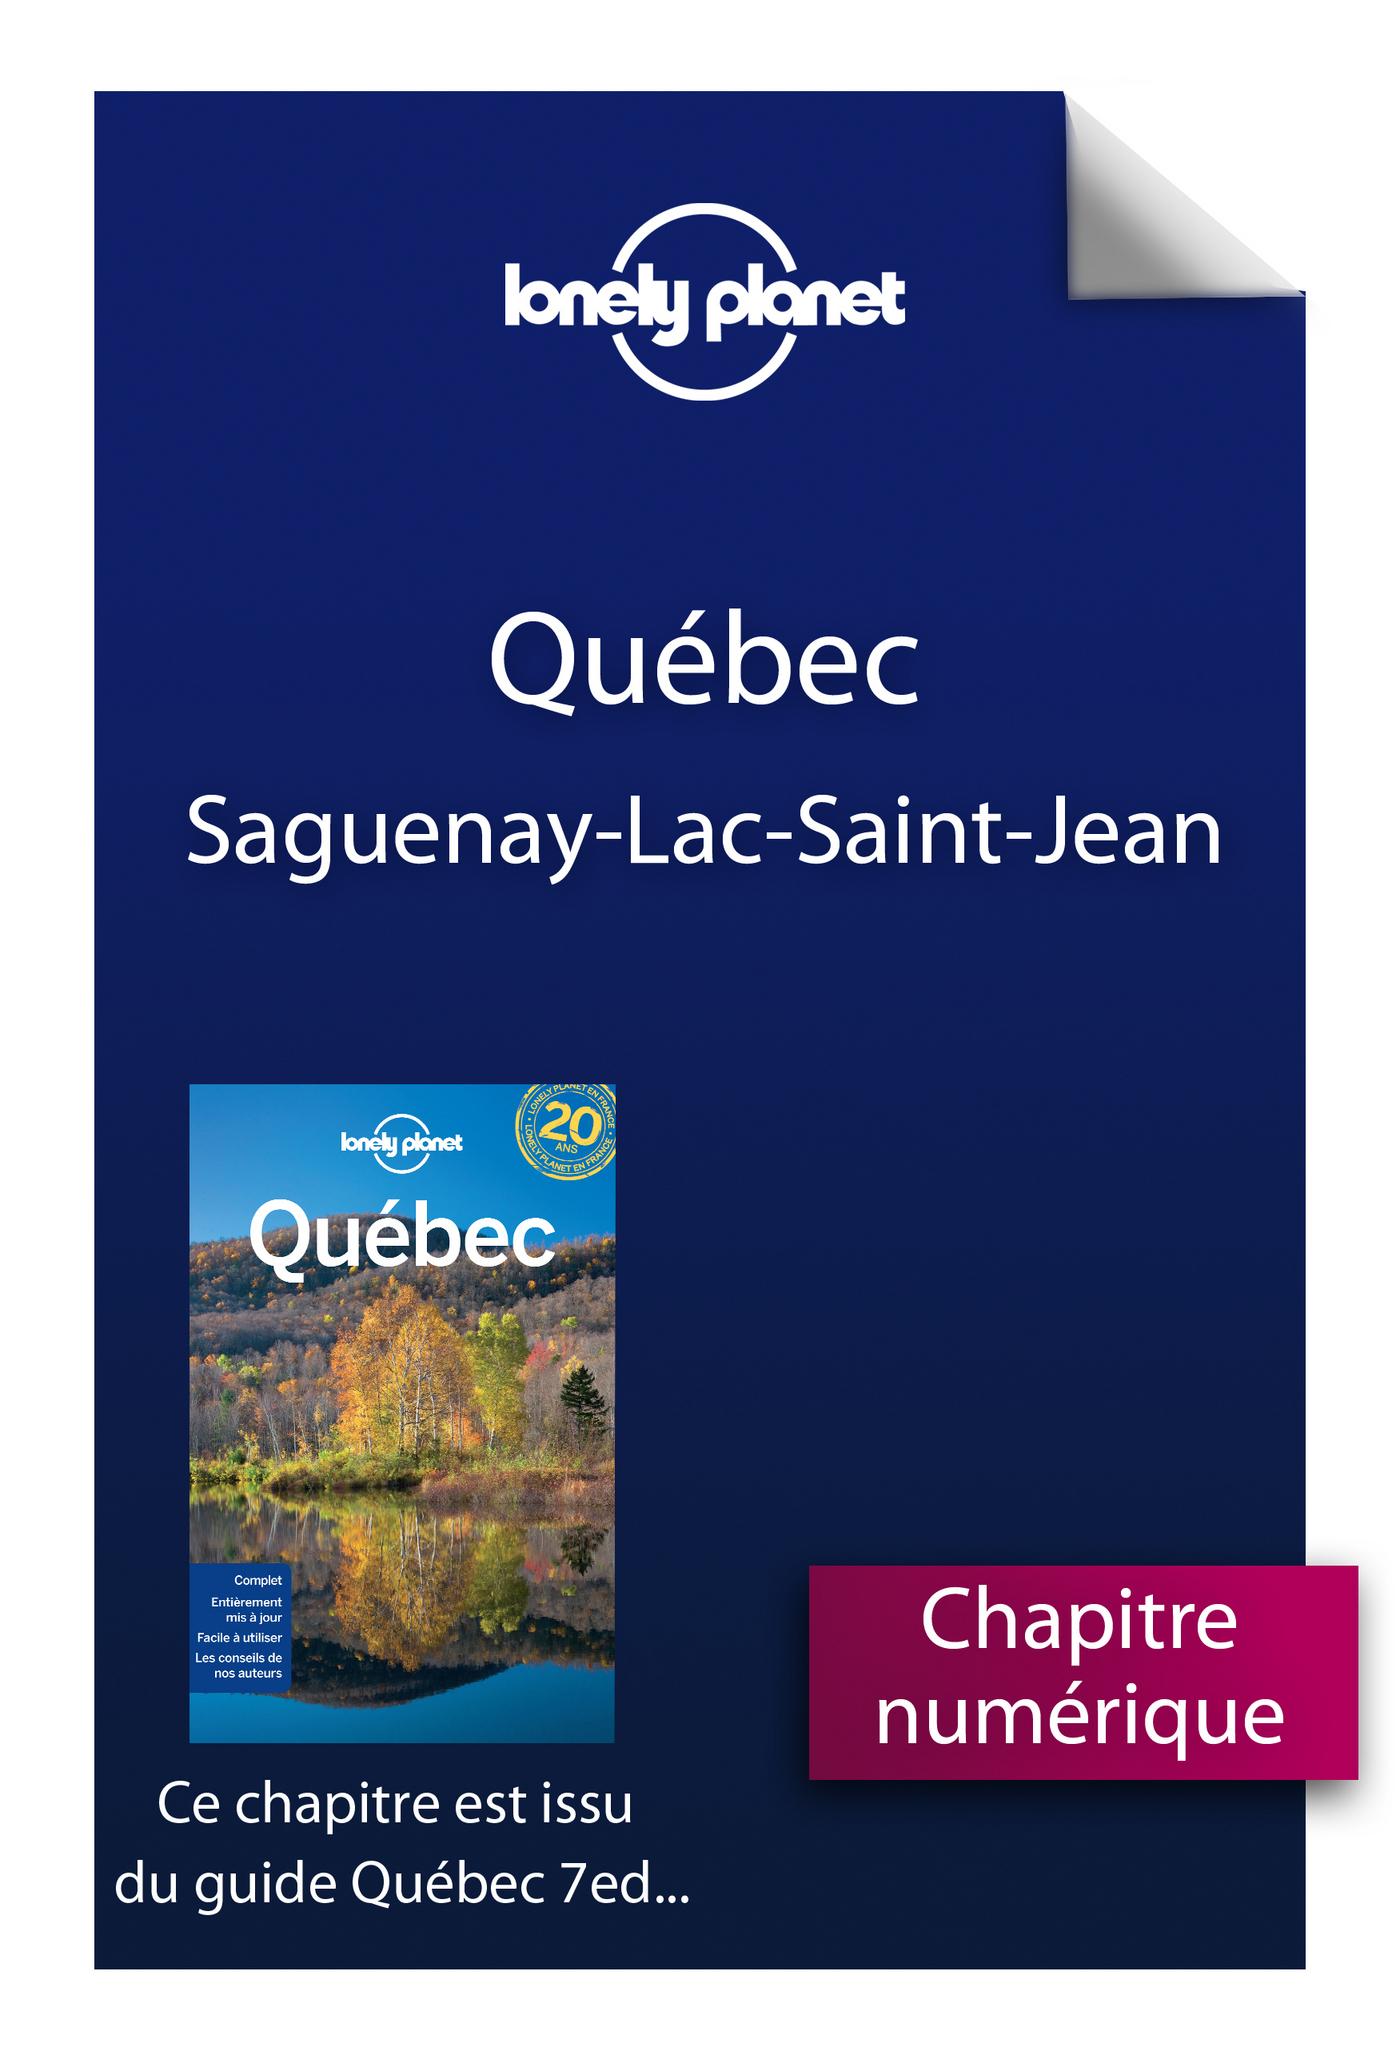 Québec 7 - Saguenay-Lac-Saint-Jean